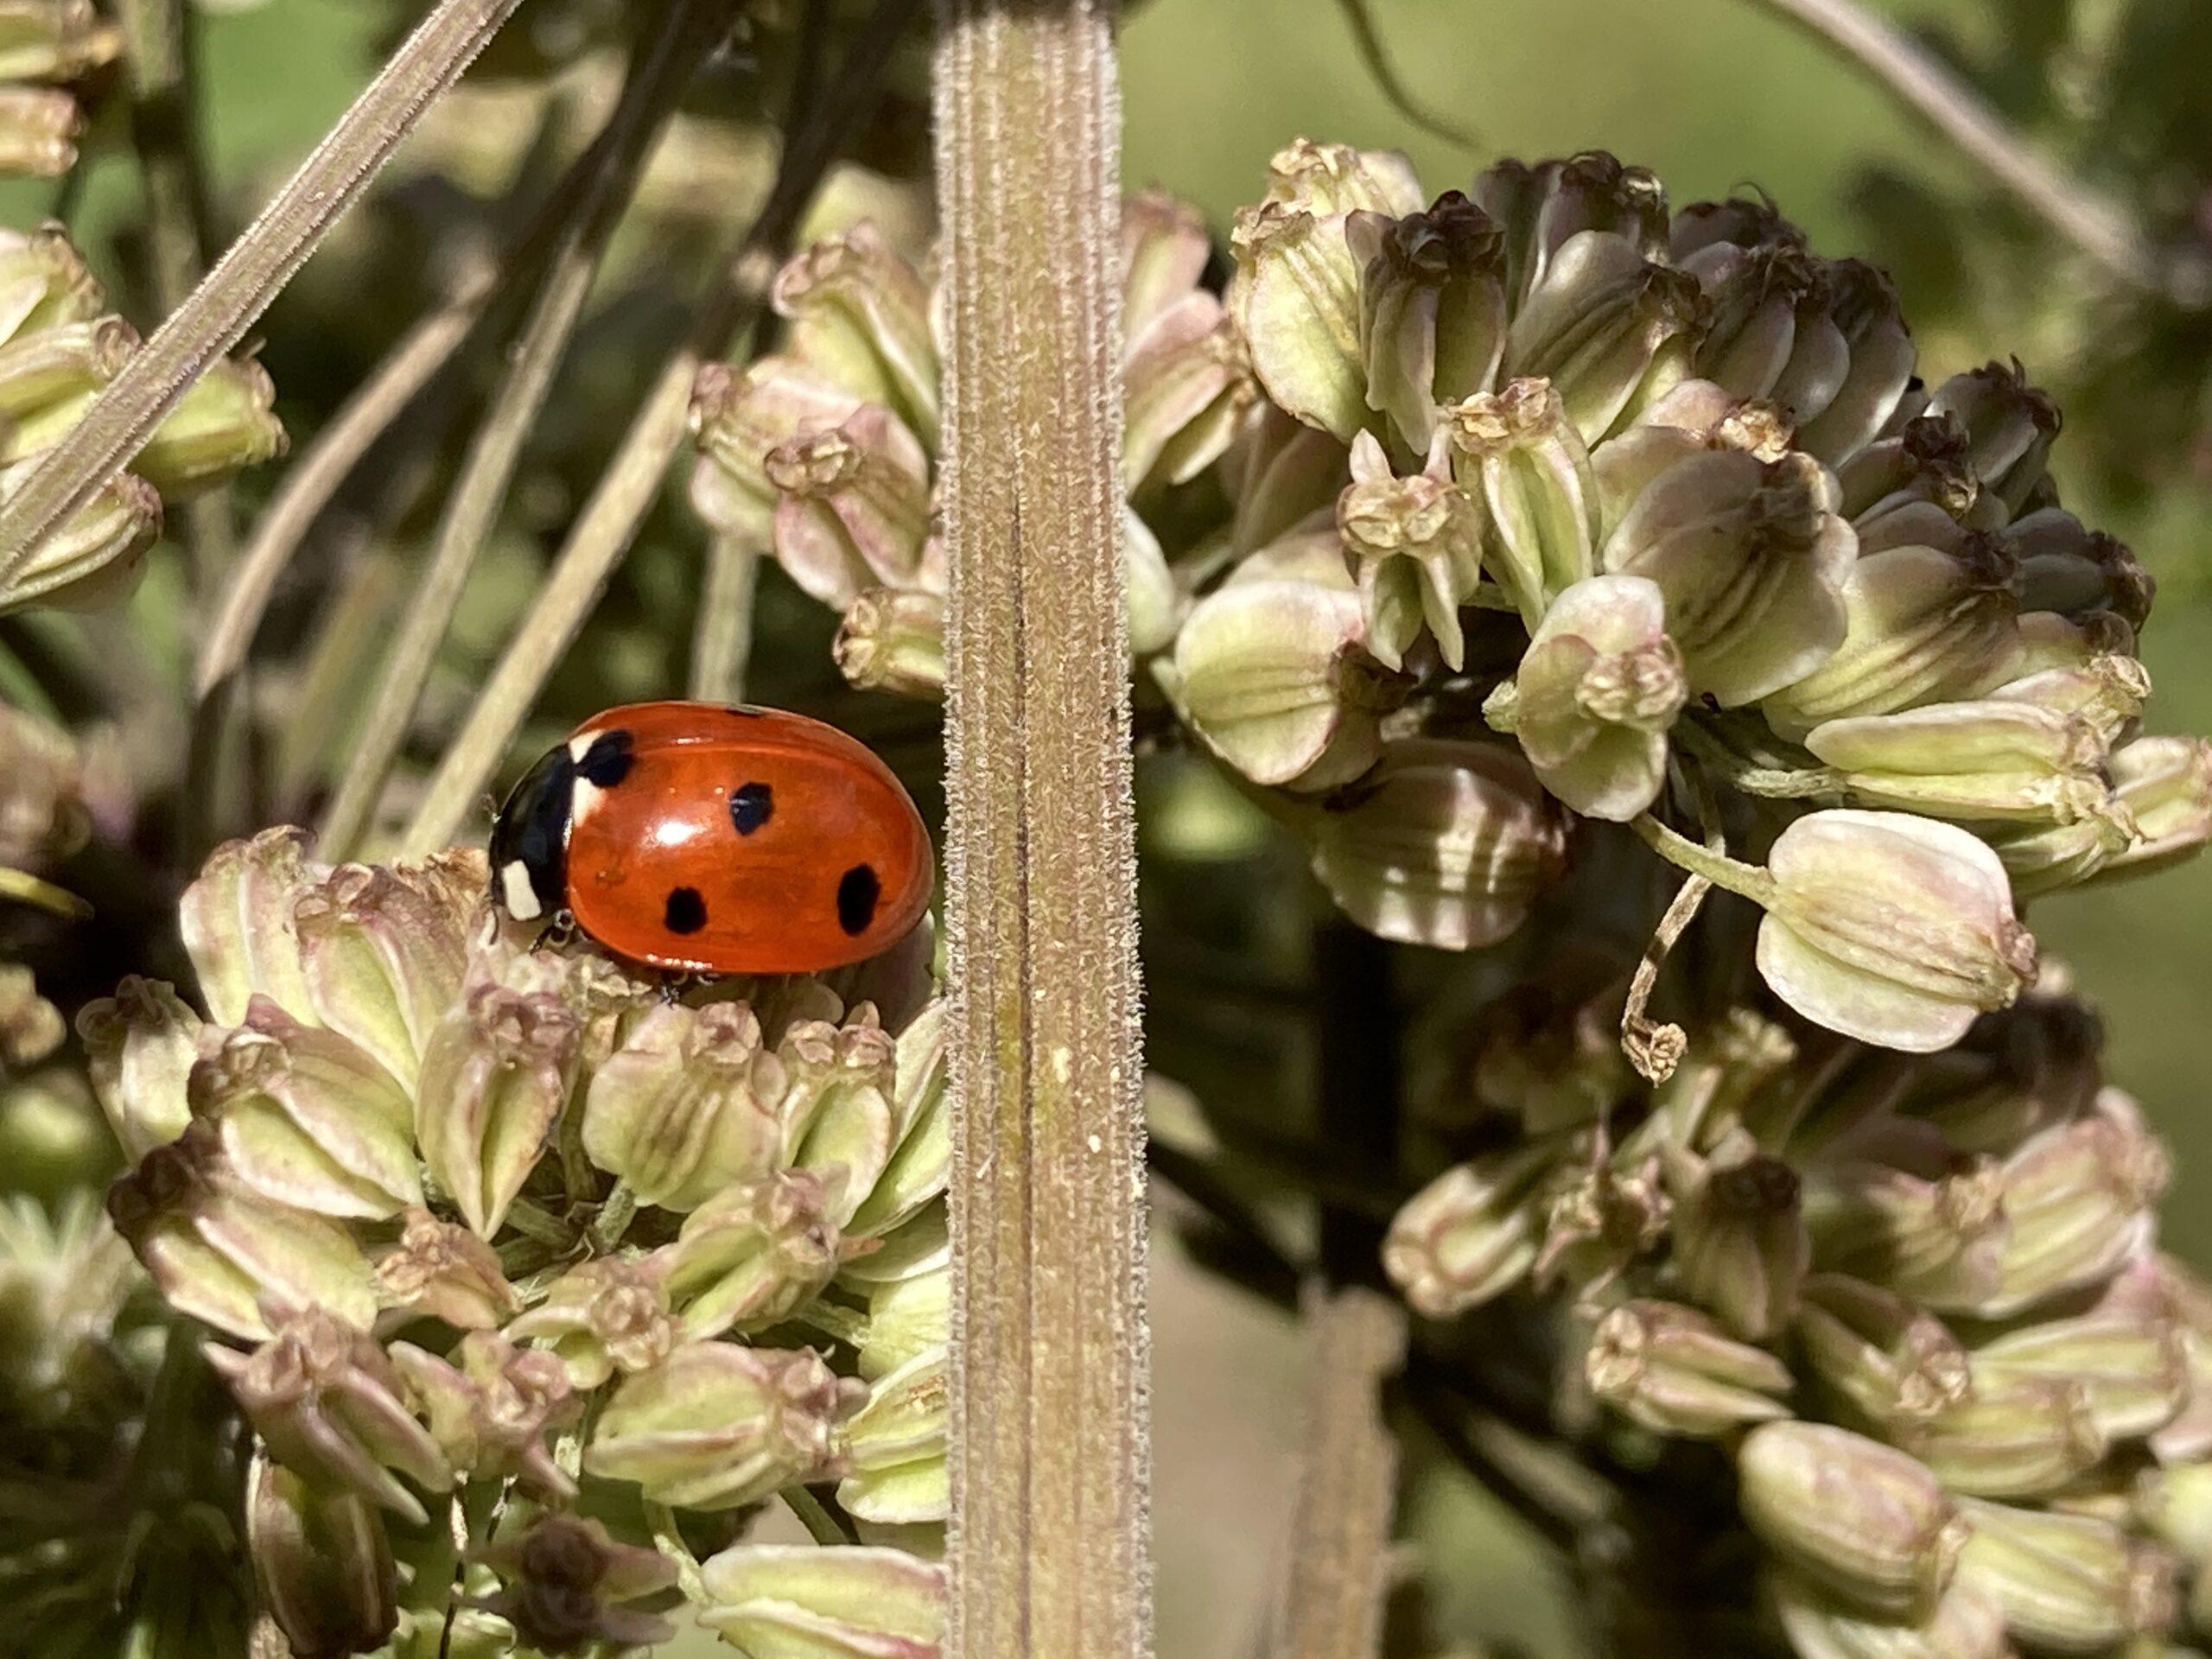 Sevenspot ladybird (Coccinella septempunctata)